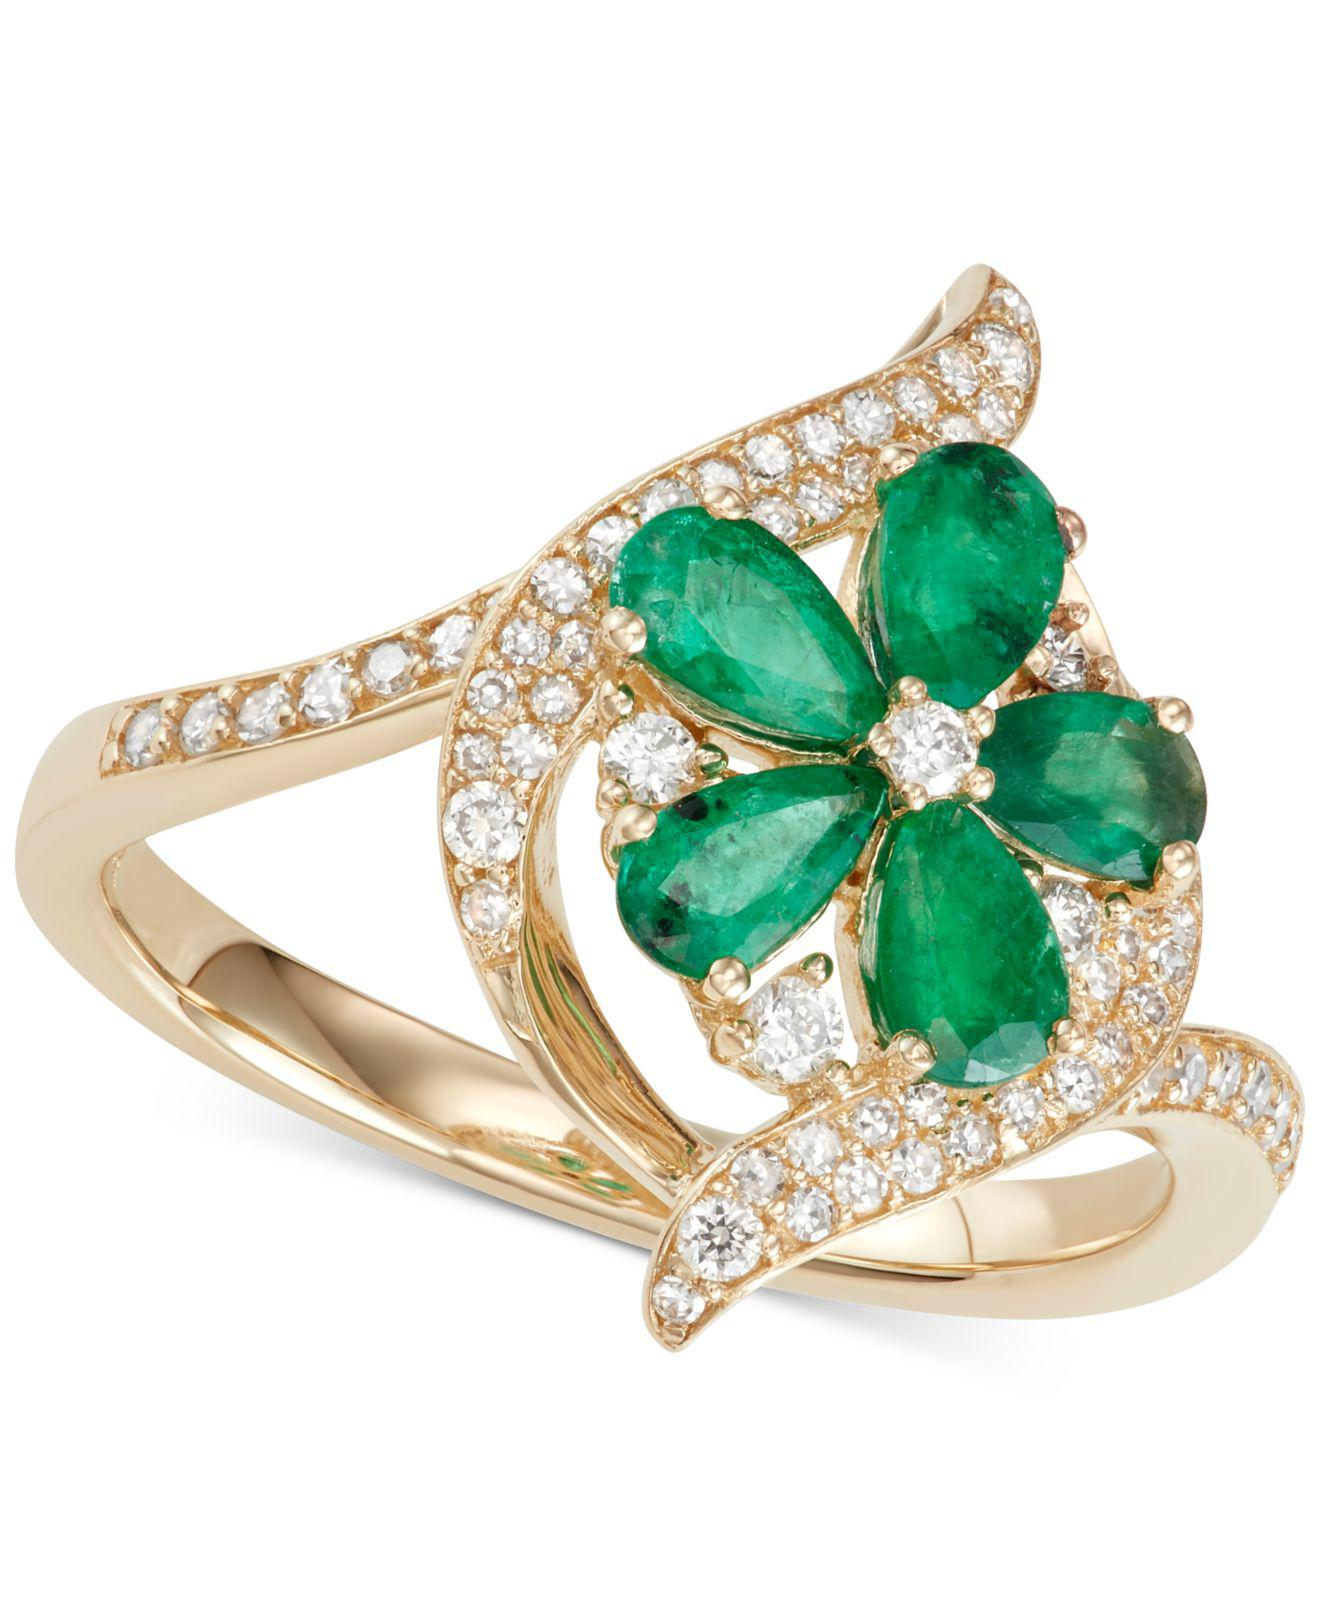 edf6cae70 Lyst - Macy's Emerald (1-1/5 Ct.t.w.) & Diamond (1/3 Ct. T.w.) Ring ...